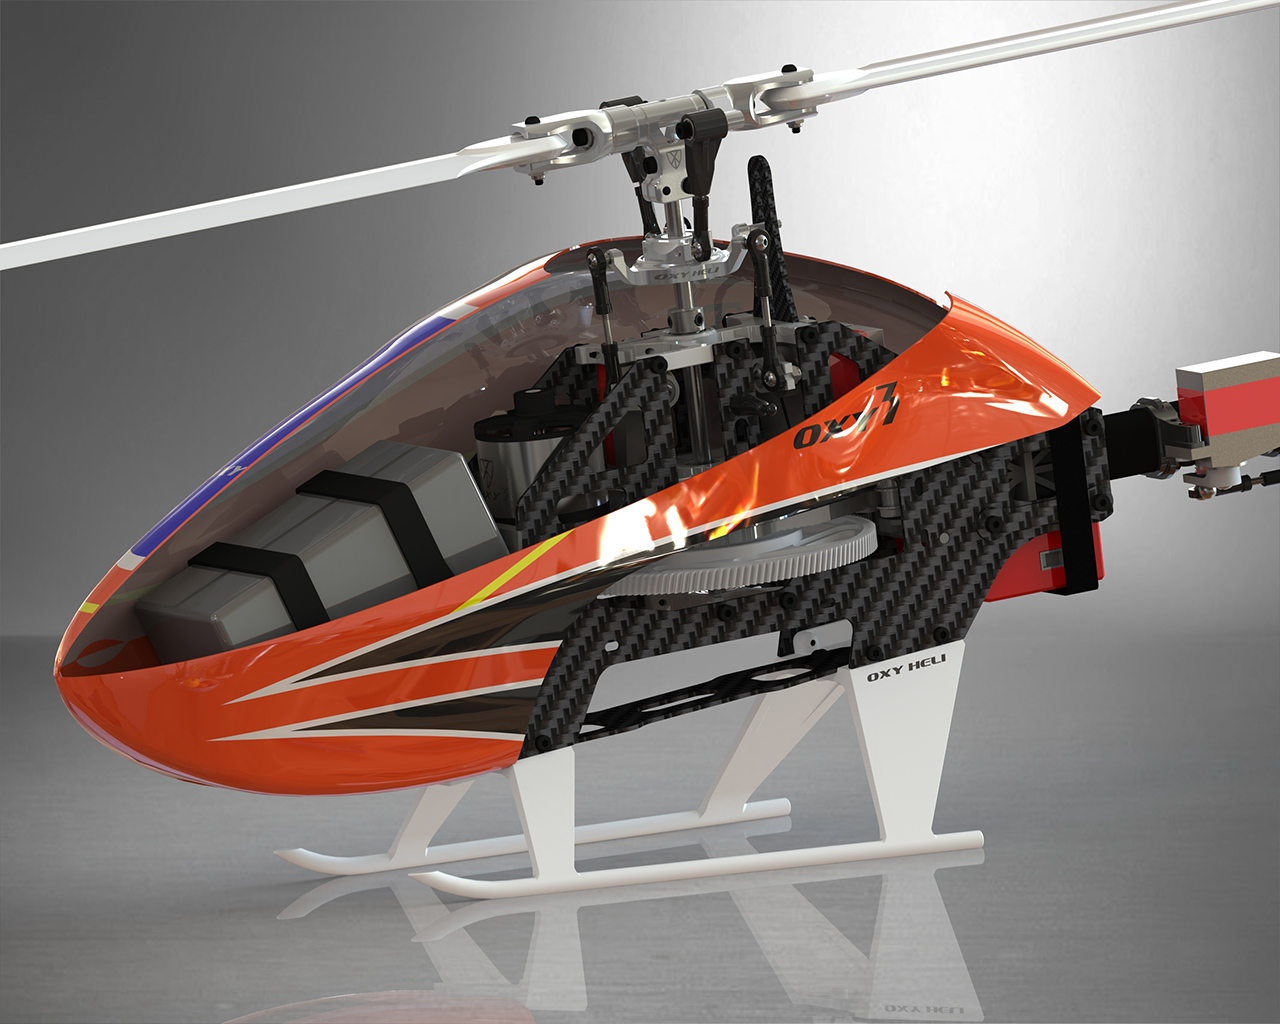 OXY 3 - Canopy design & Oxy 3 Helicopter Kit u2039 OXY Helicopter